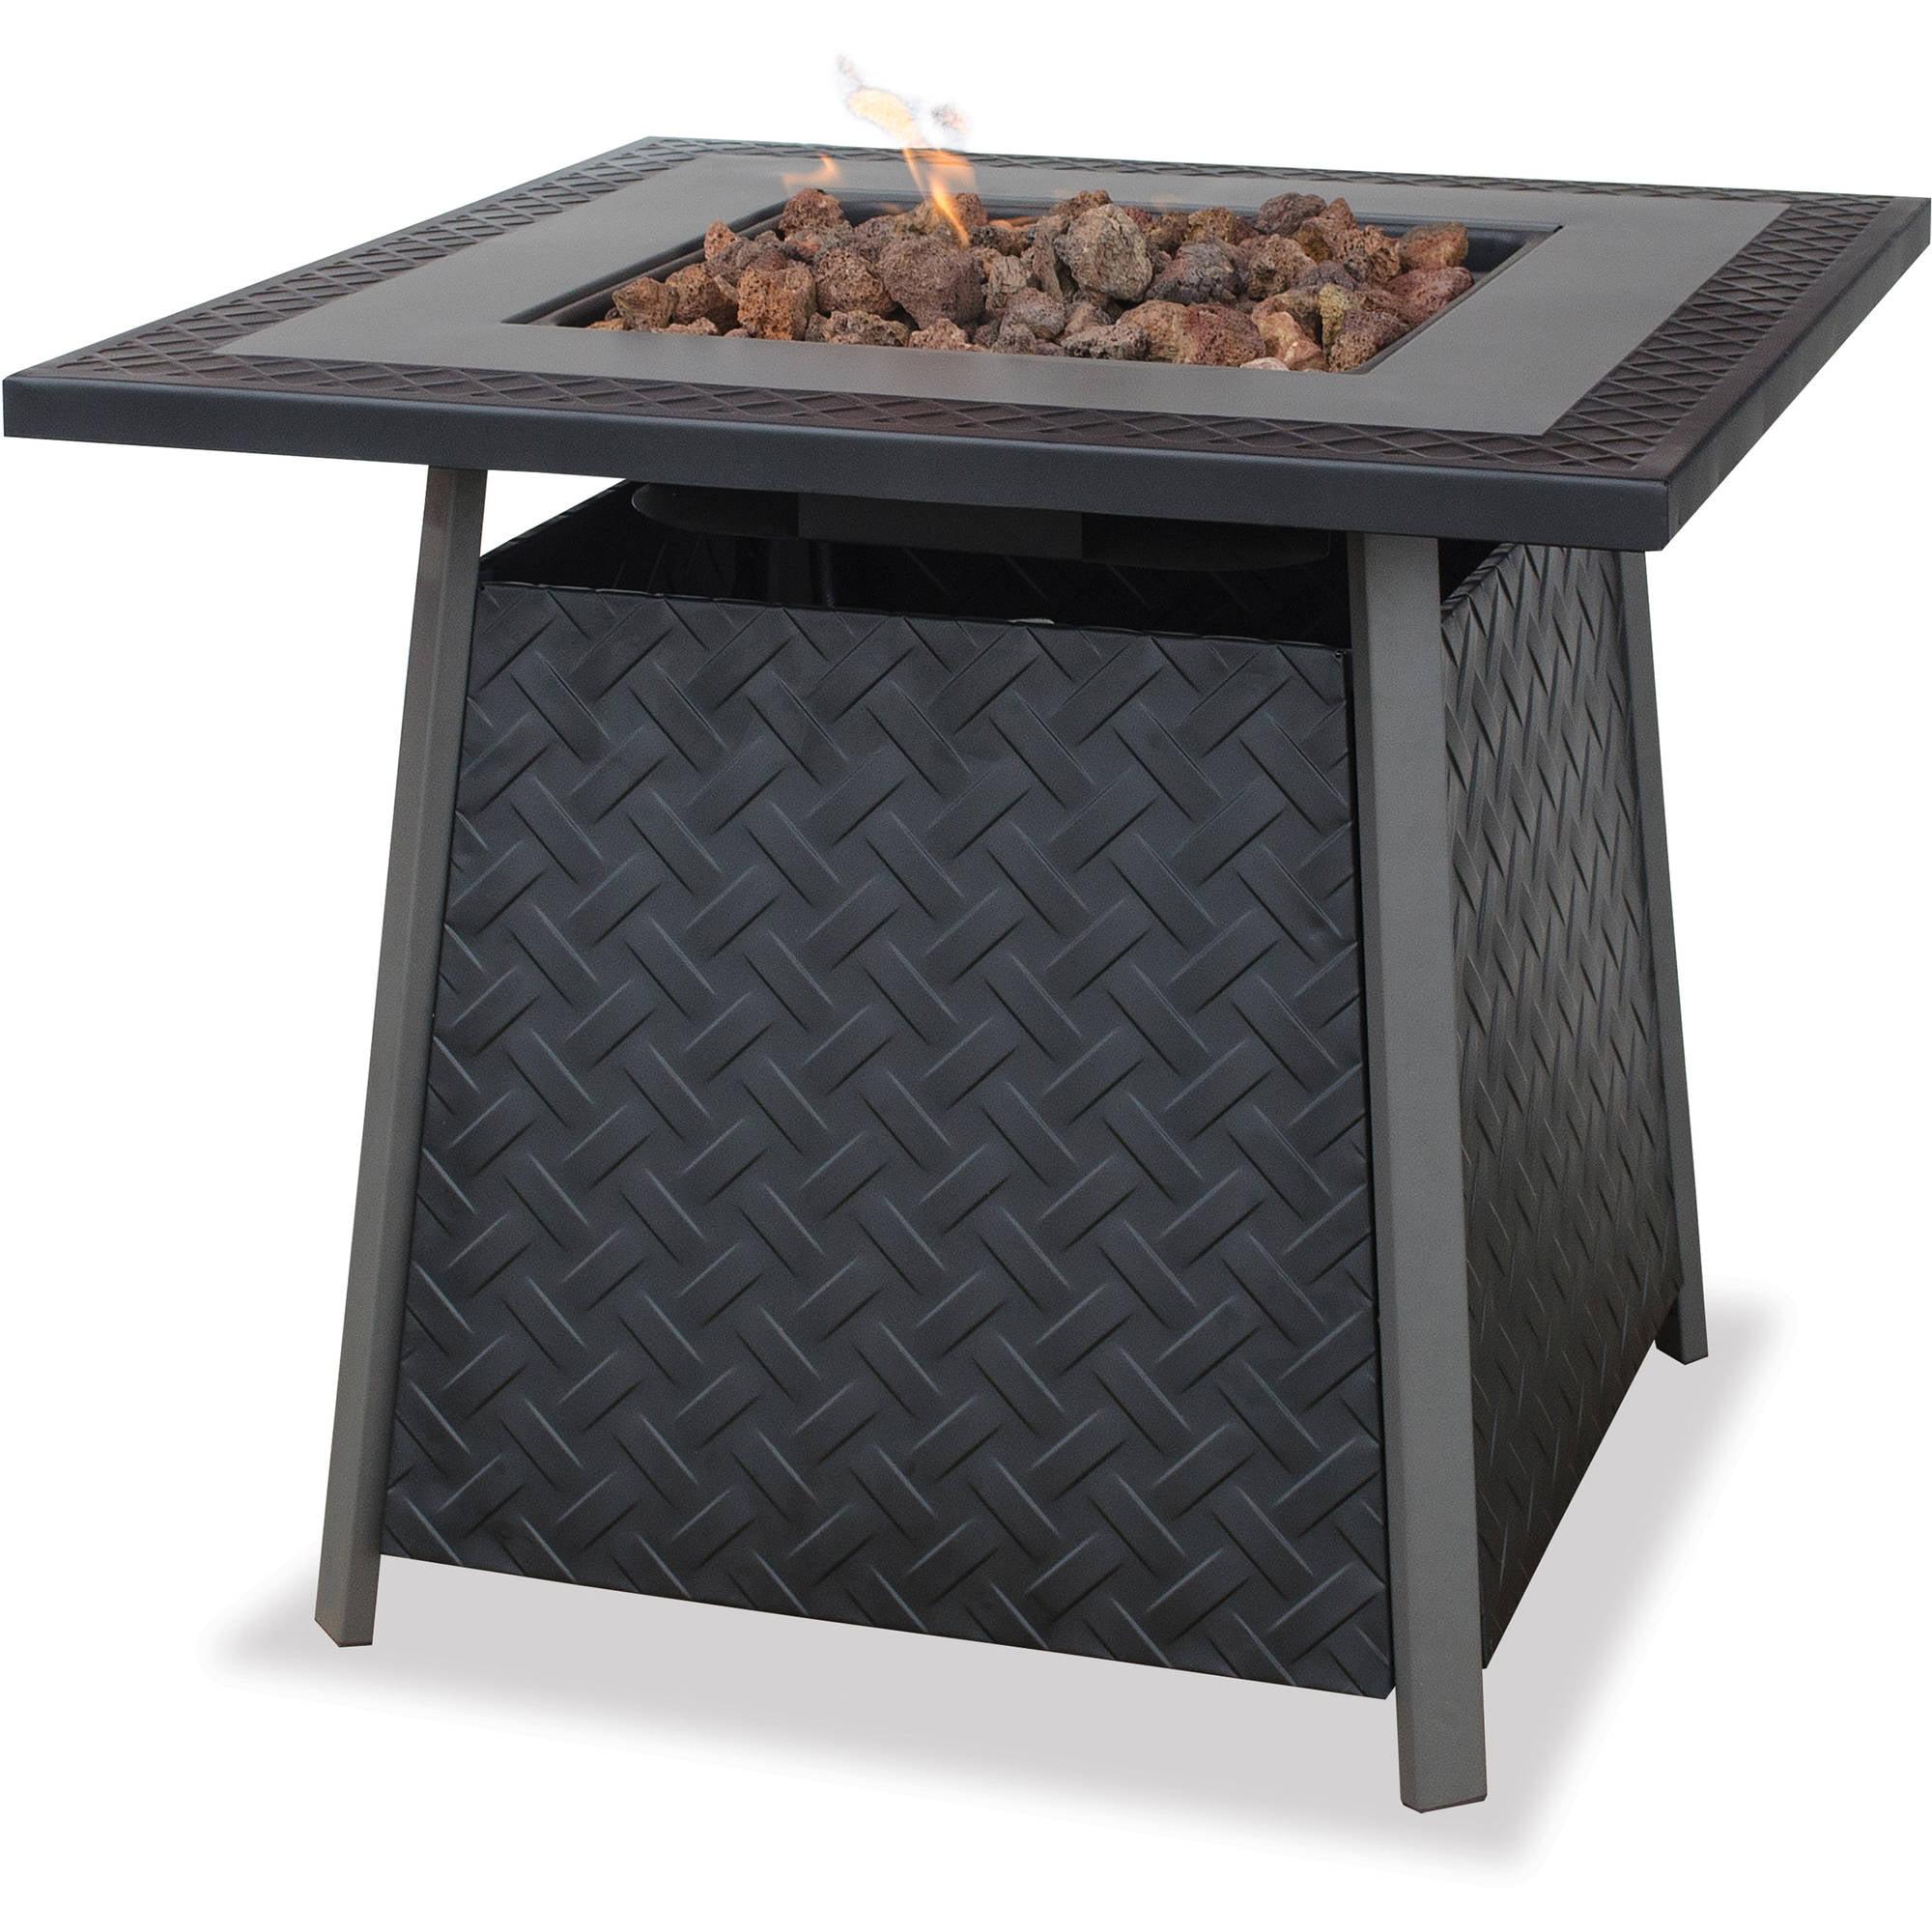 UniFlame LP Gas Slate Finish Fire Pit Table